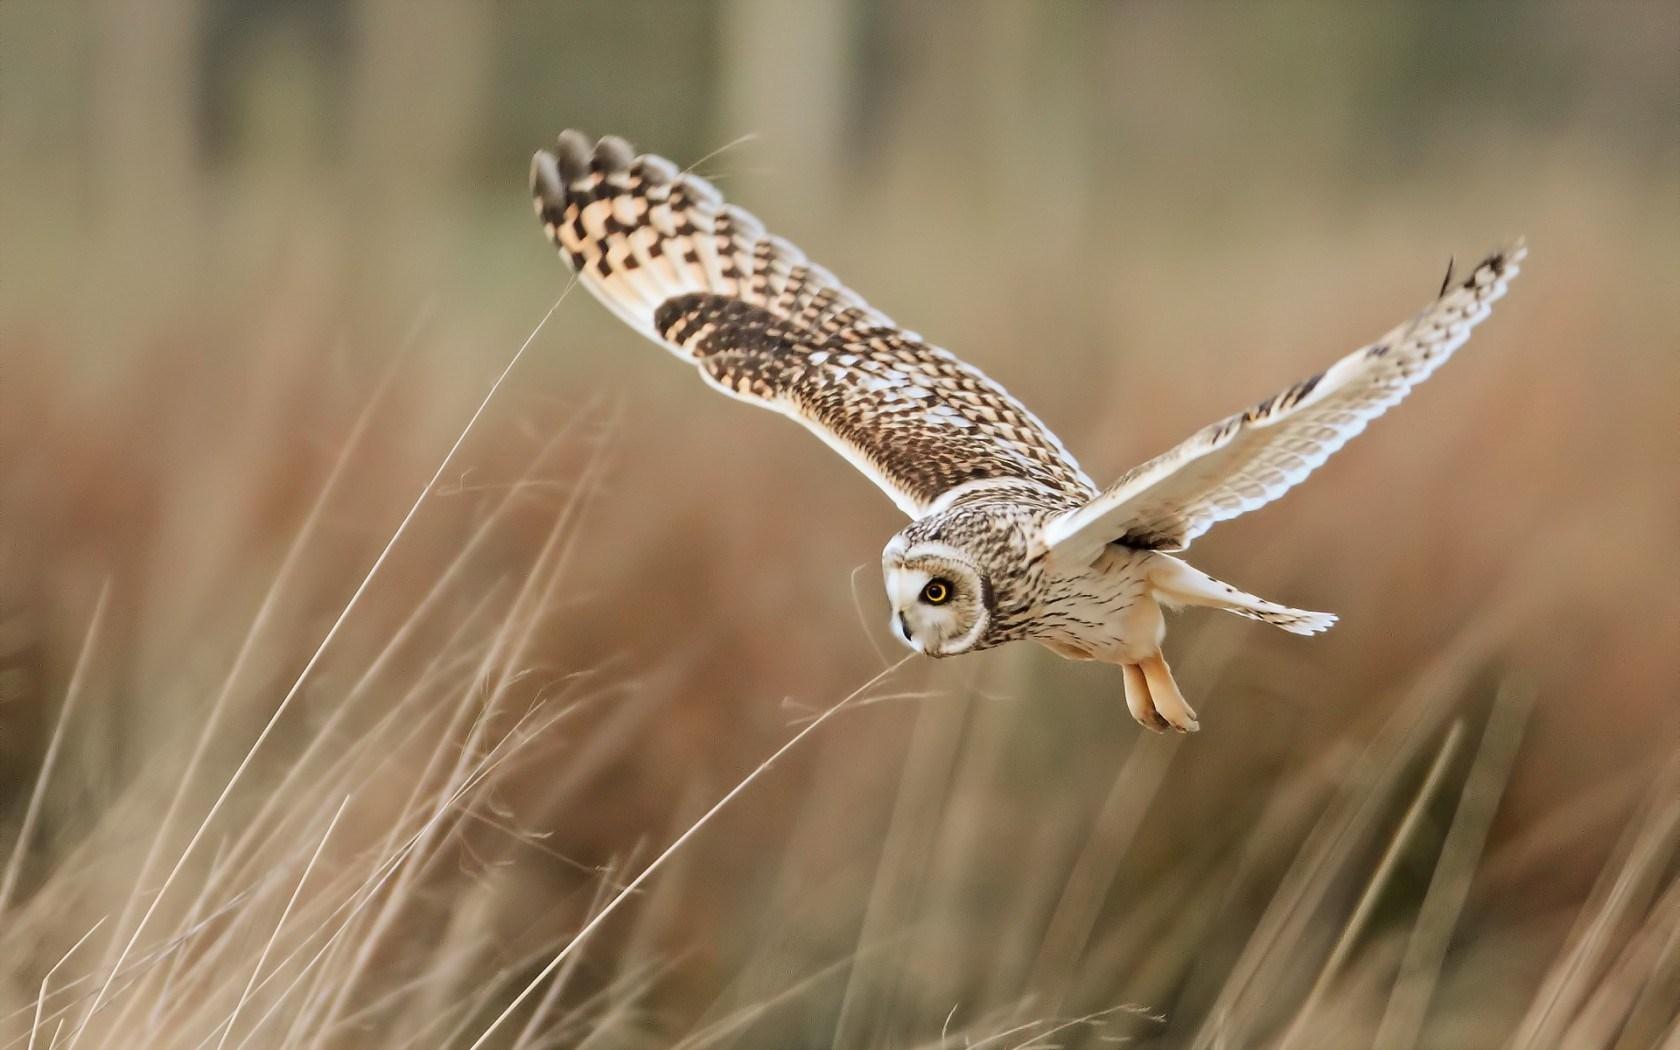 owl wallpaper hd 1366x768